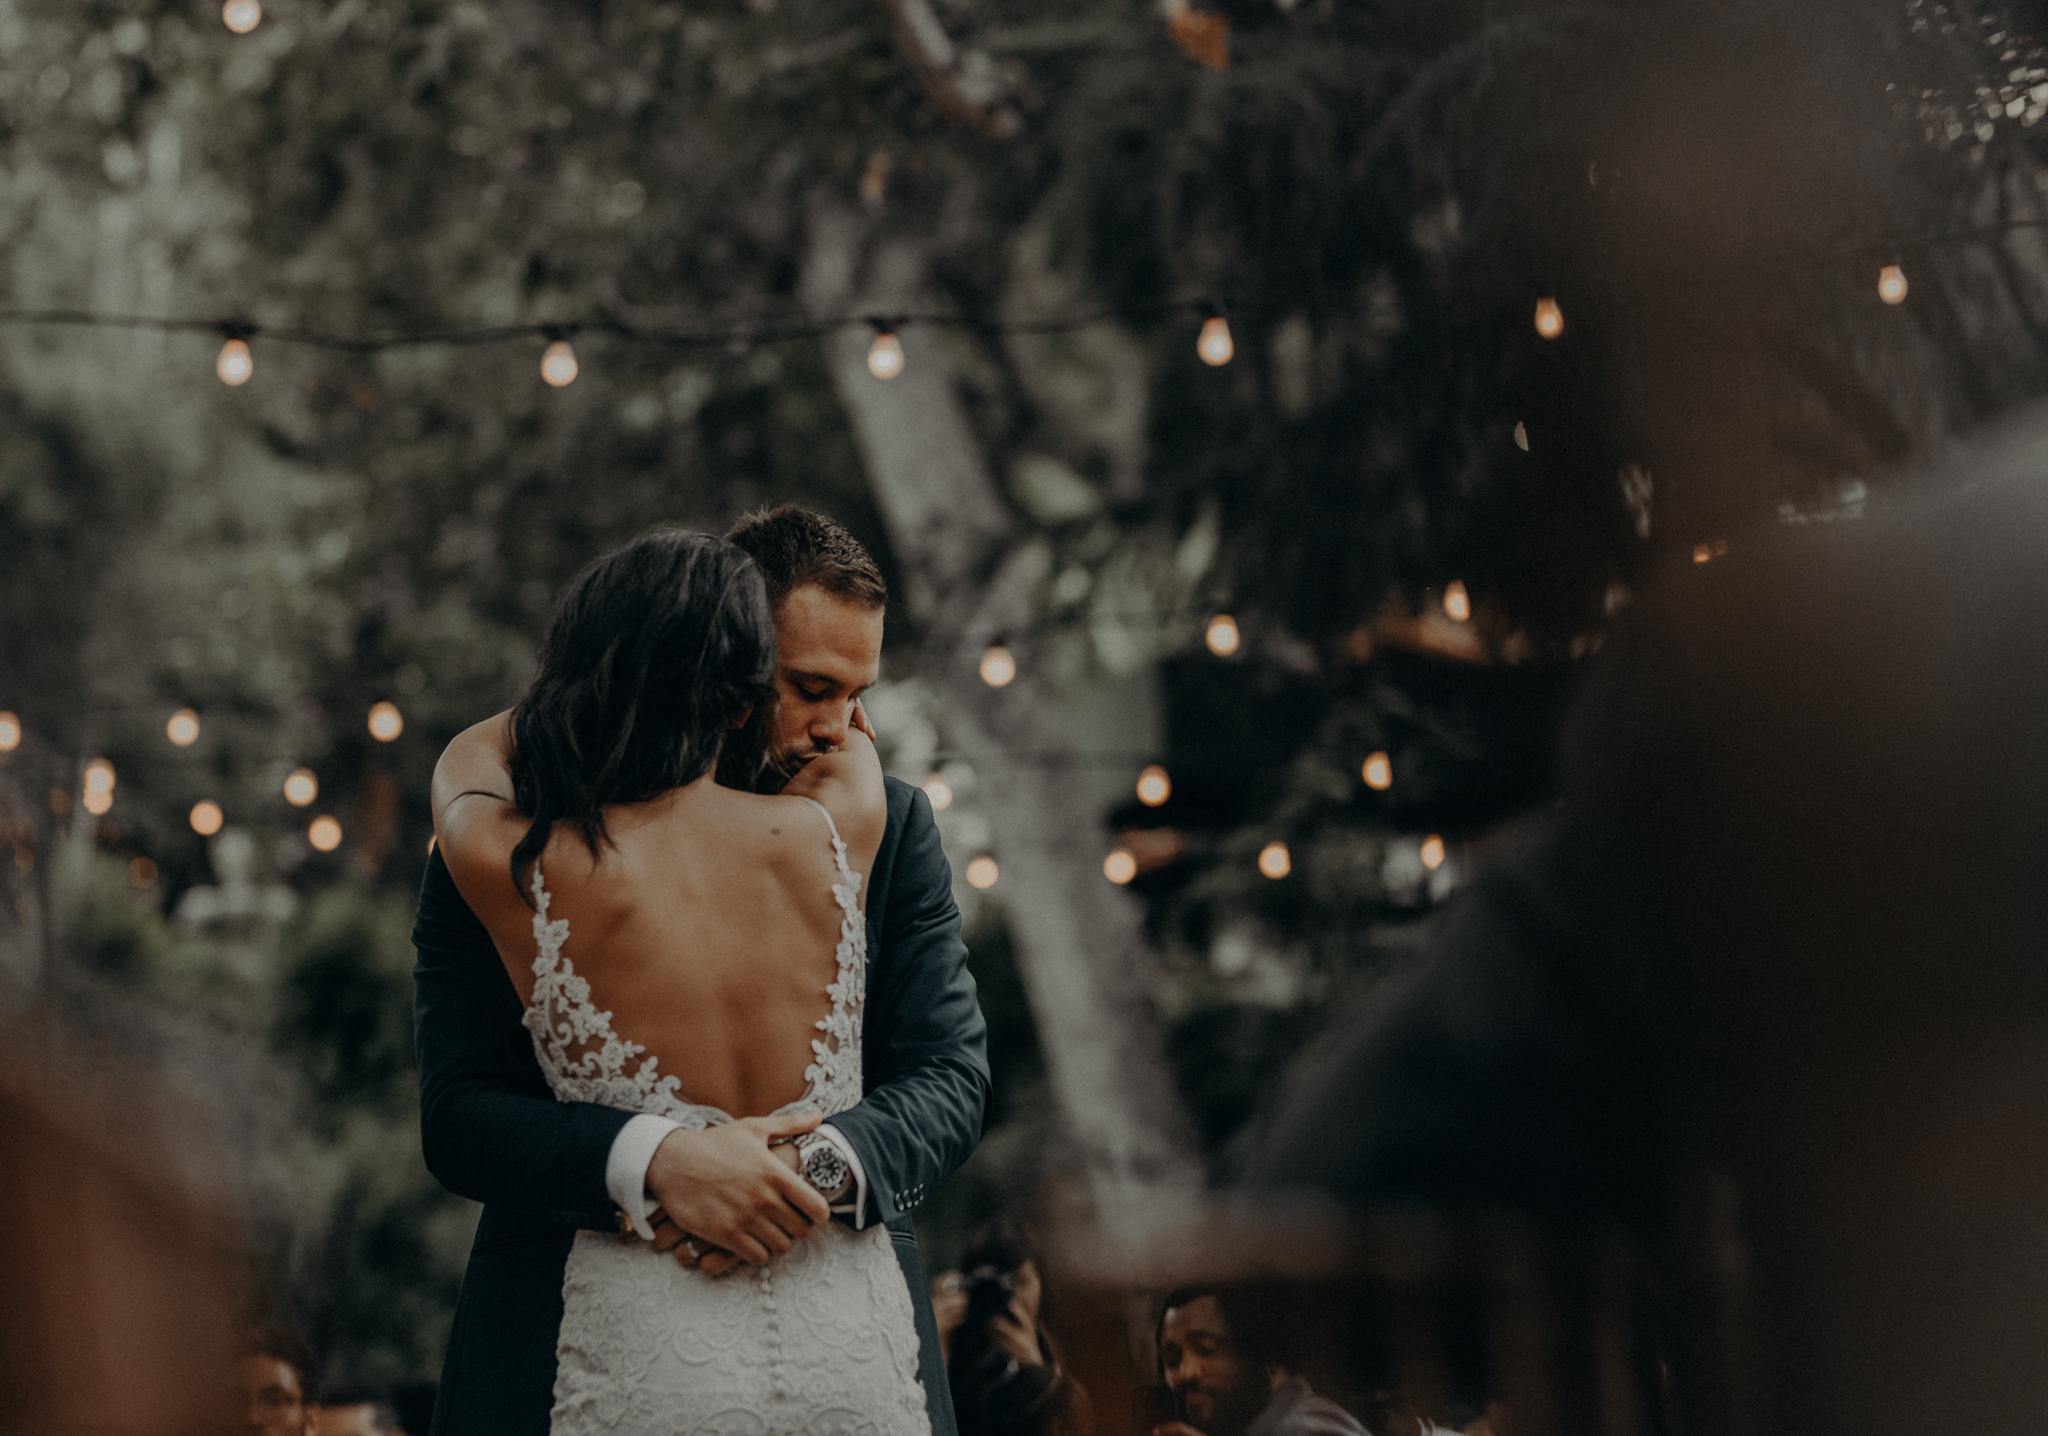 Isaiah + Taylor Photography - Rancho Las Lomas Wedding, Los Angeles Wedding Photographer-144.jpg